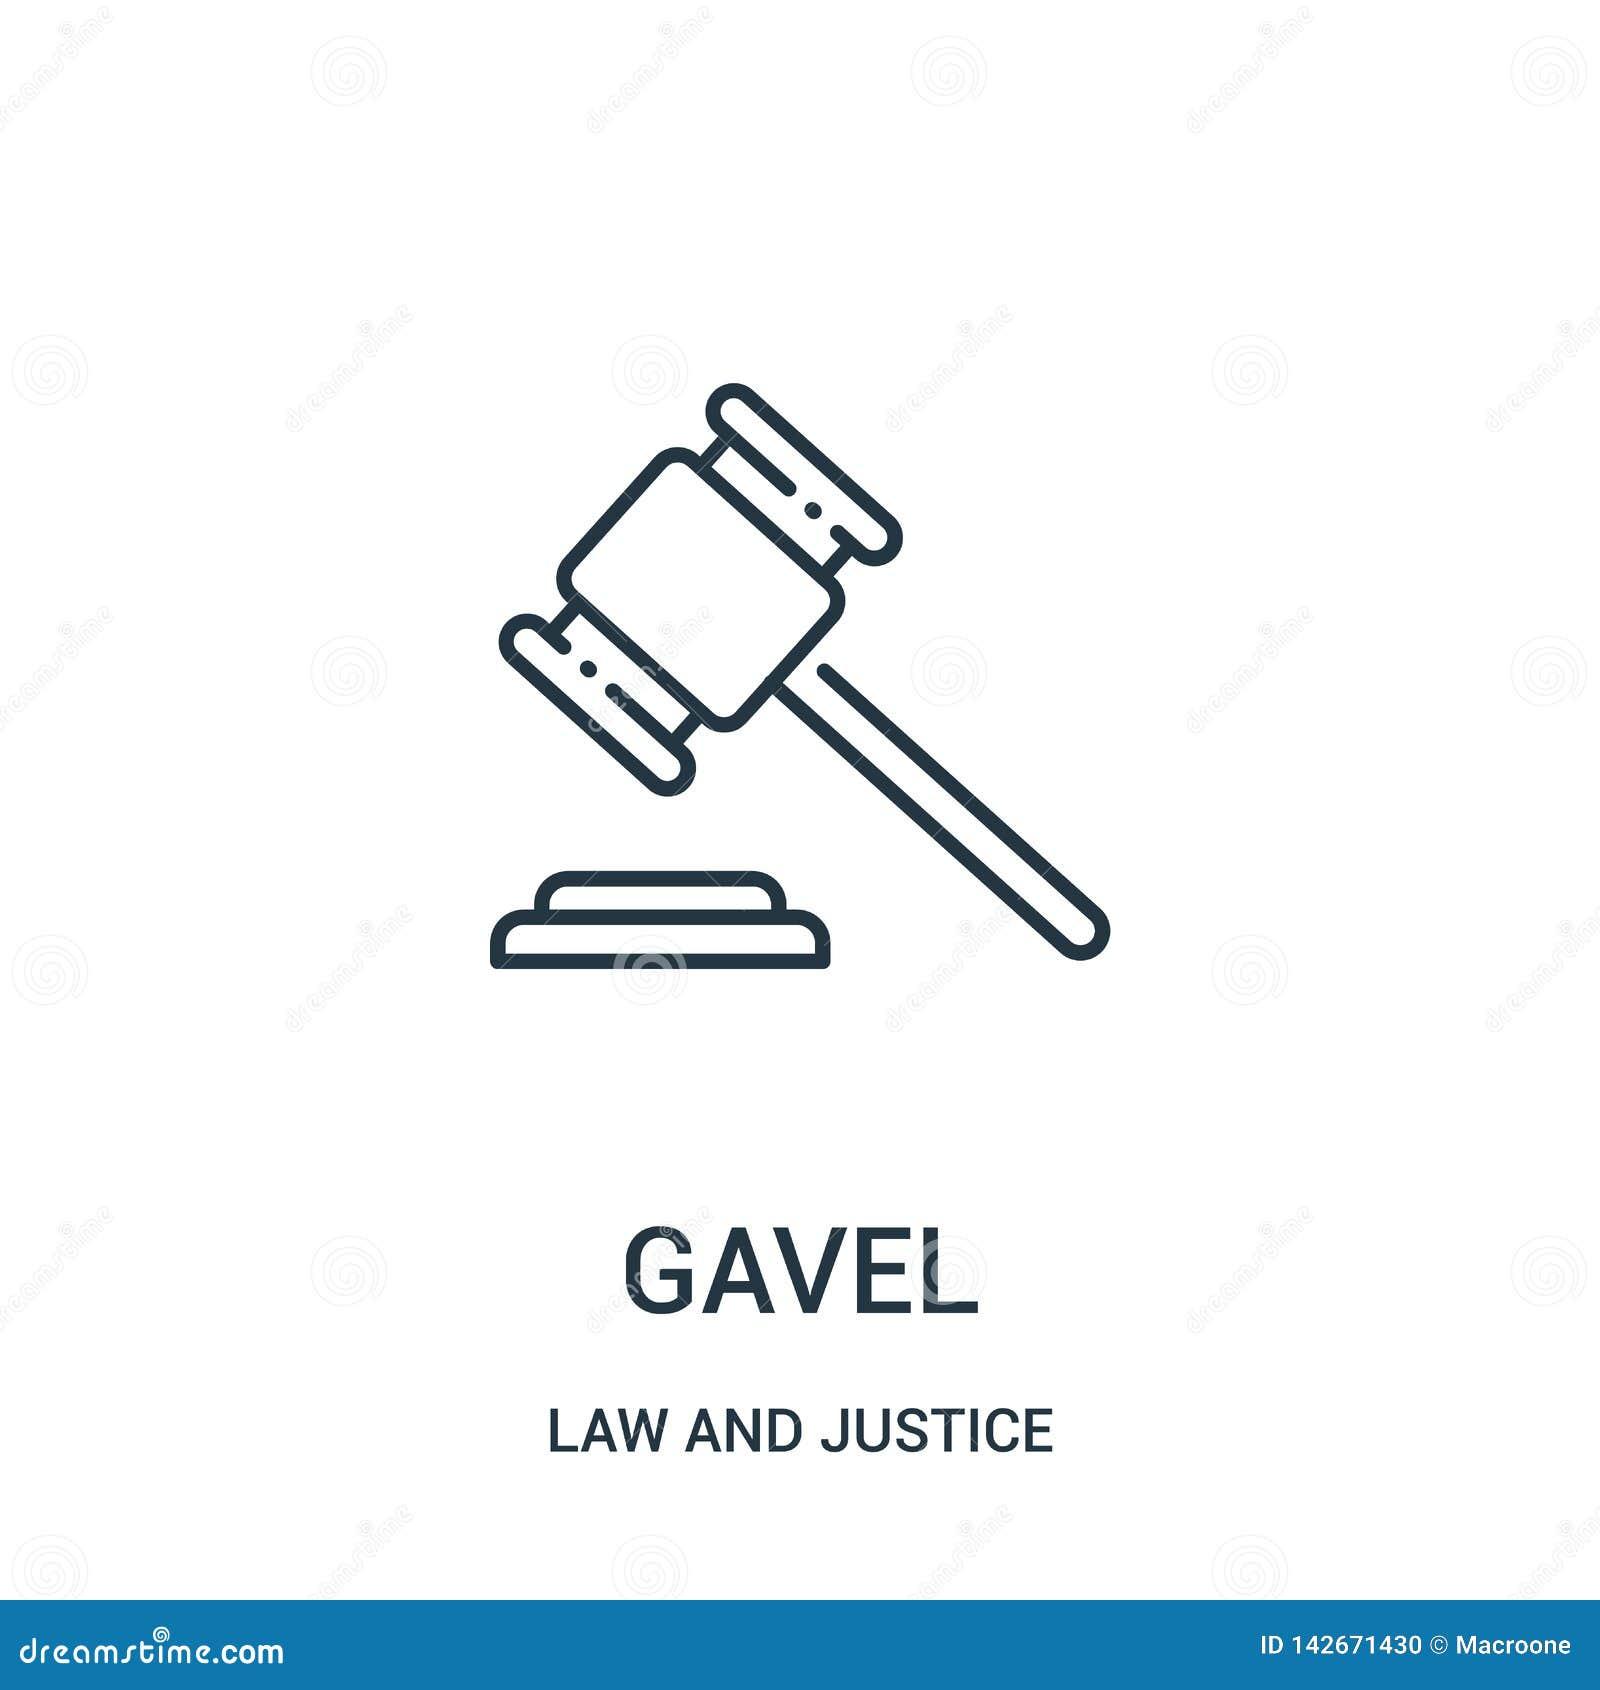 Gavel διάνυσμα εικονιδίων από τη συλλογή νόμου και δικαιοσύνης Λεπτή gavel γραμμών διανυσματική απεικόνιση εικονιδίων περιλήψεων